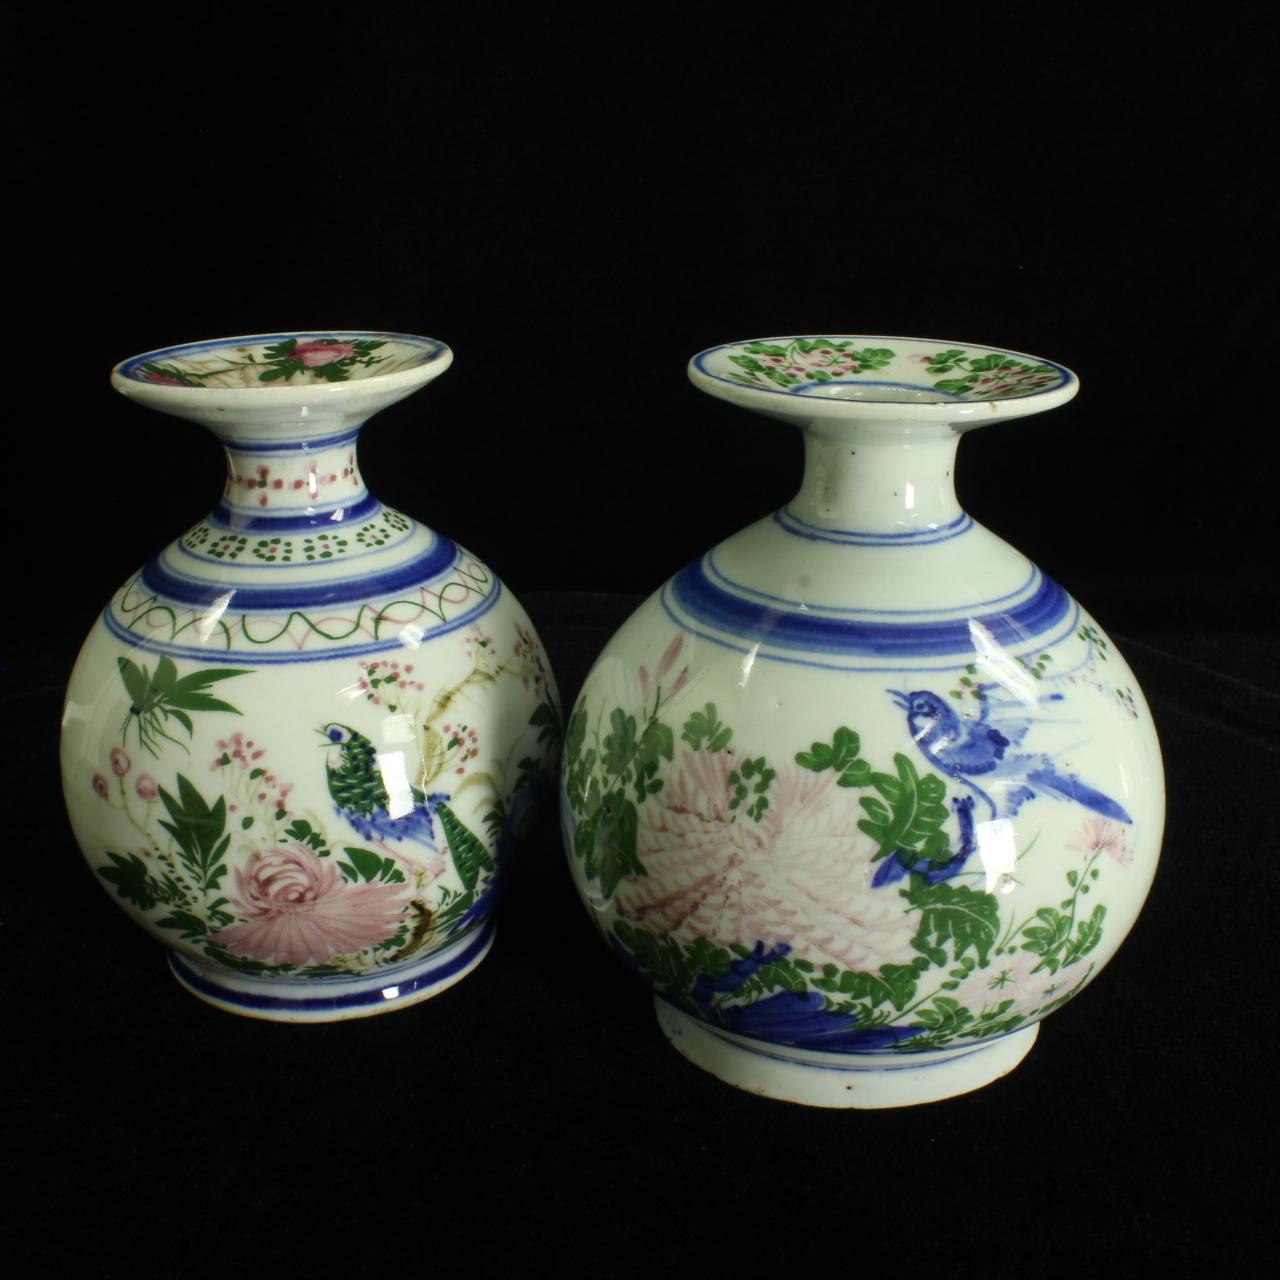 Pair of Qing Dynasty Bottle Vases